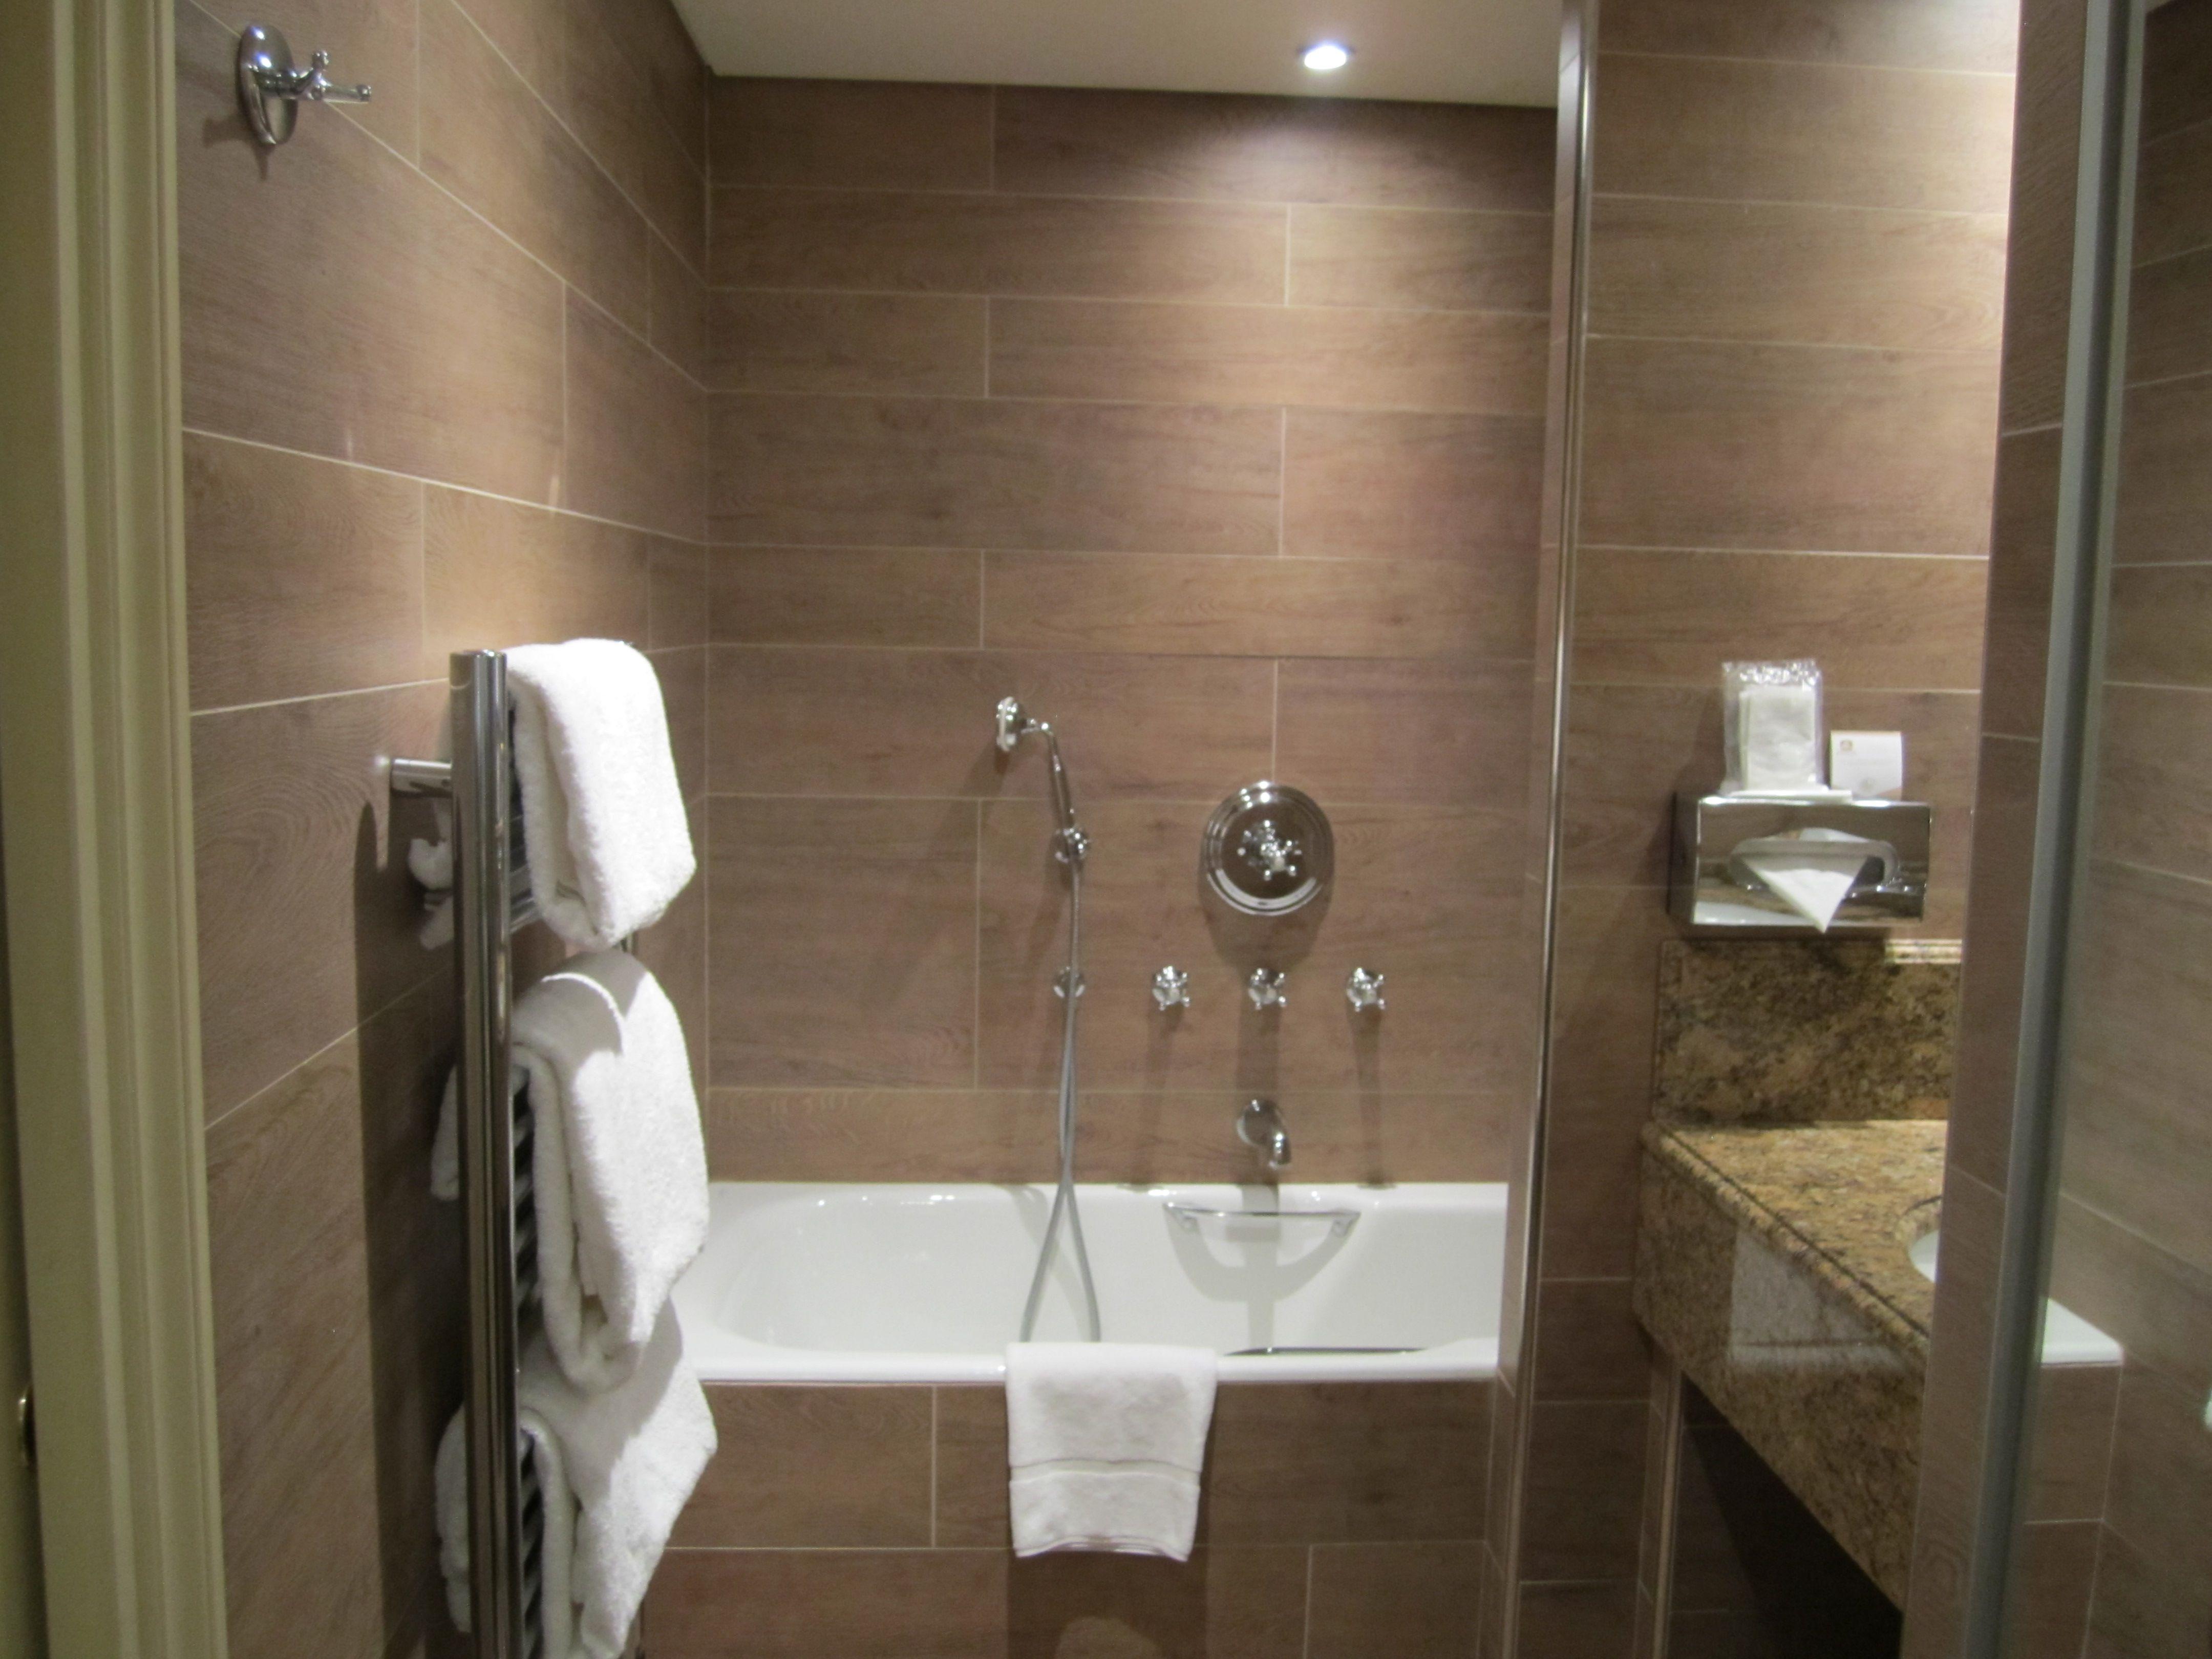 BathroomHand Shower Towel Holder Towel Rack Small Modern Bathroom - Small bathroom models